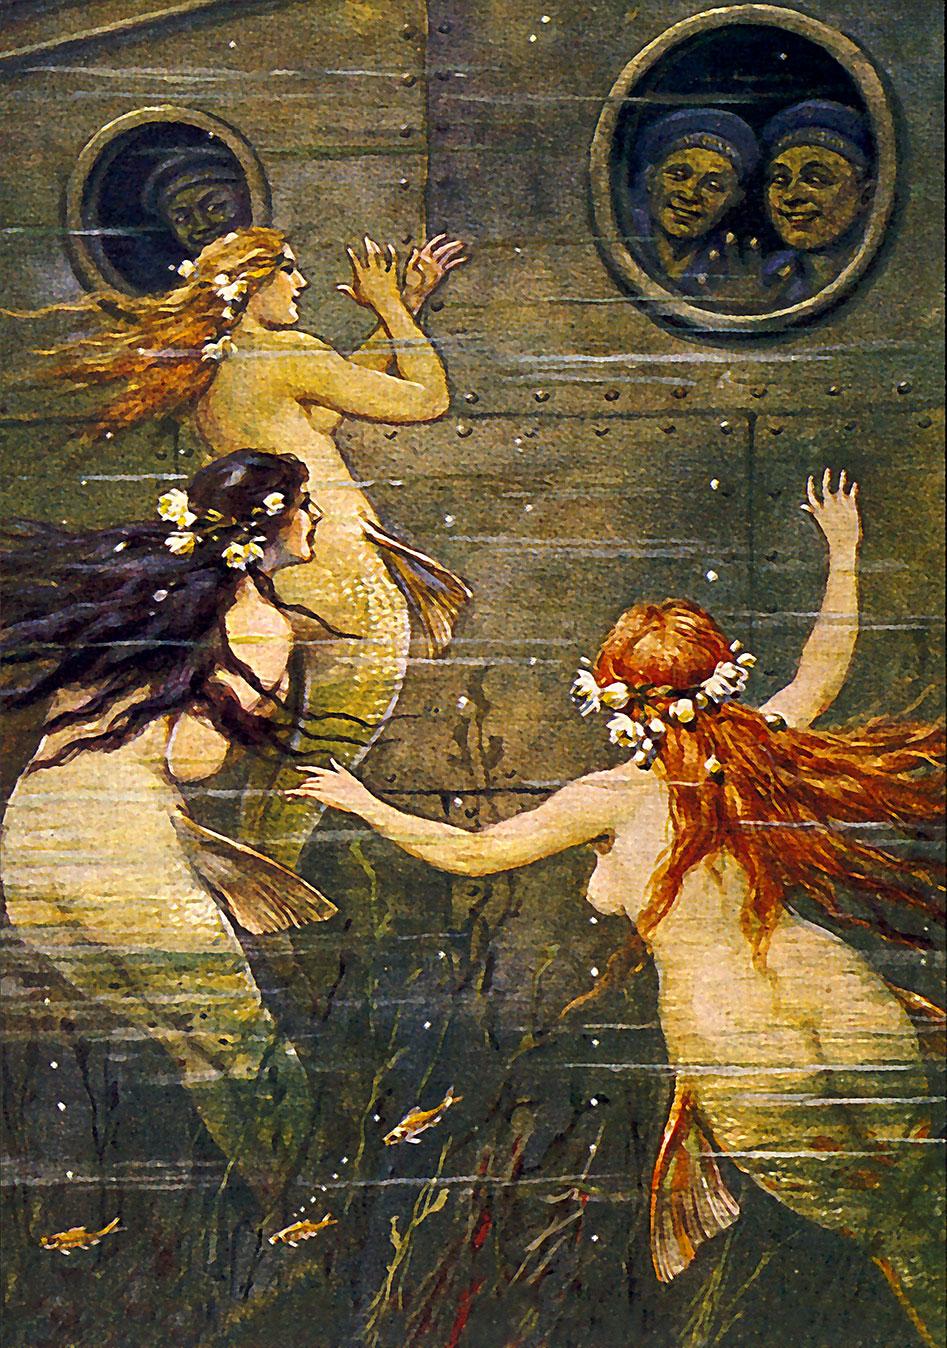 Three mermaids waving at sub crew.